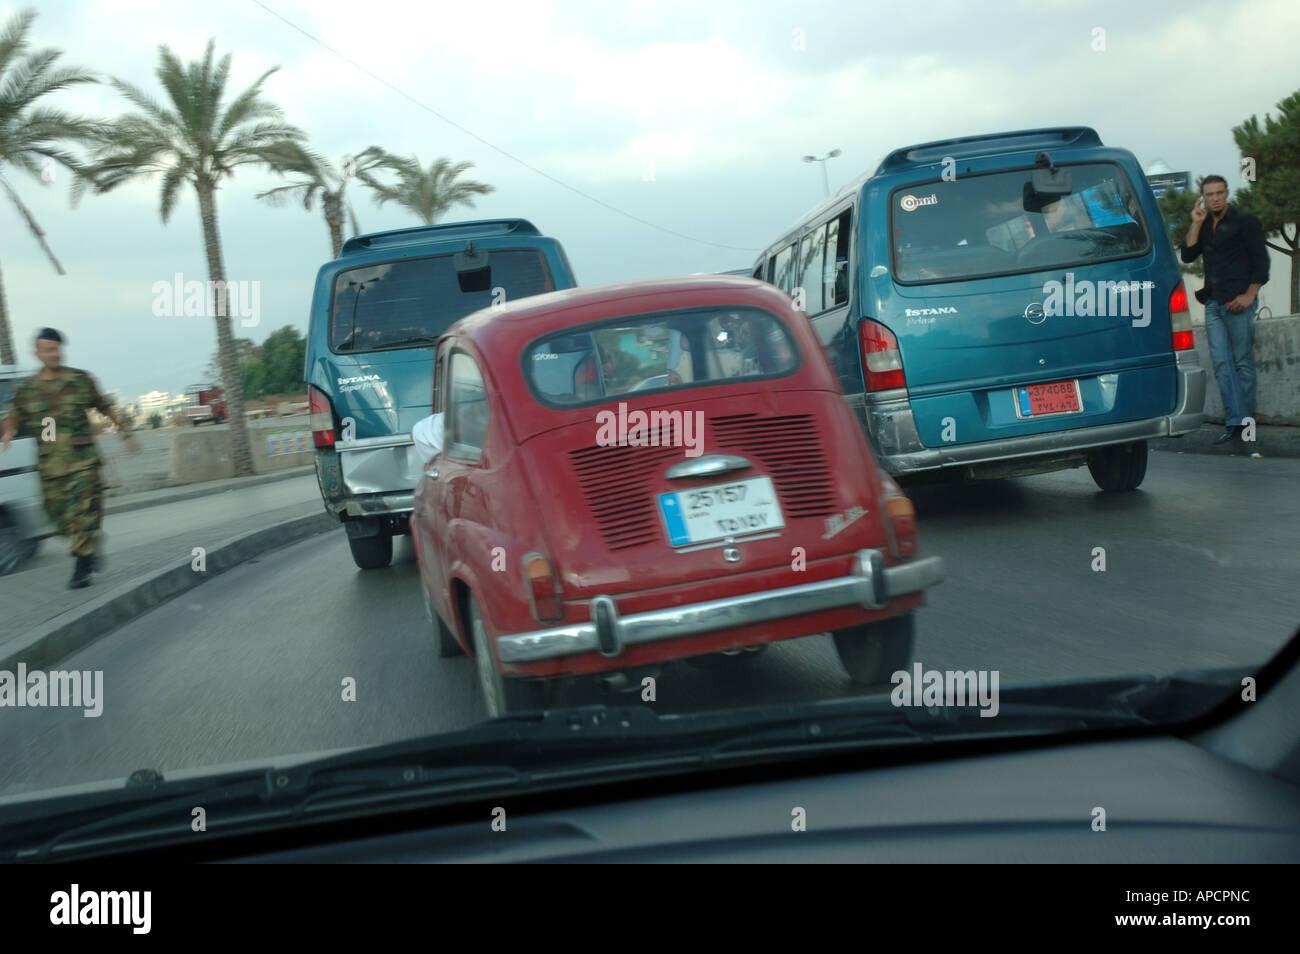 road show of classic italian mini car fiat 600 lebanon - Stock Image